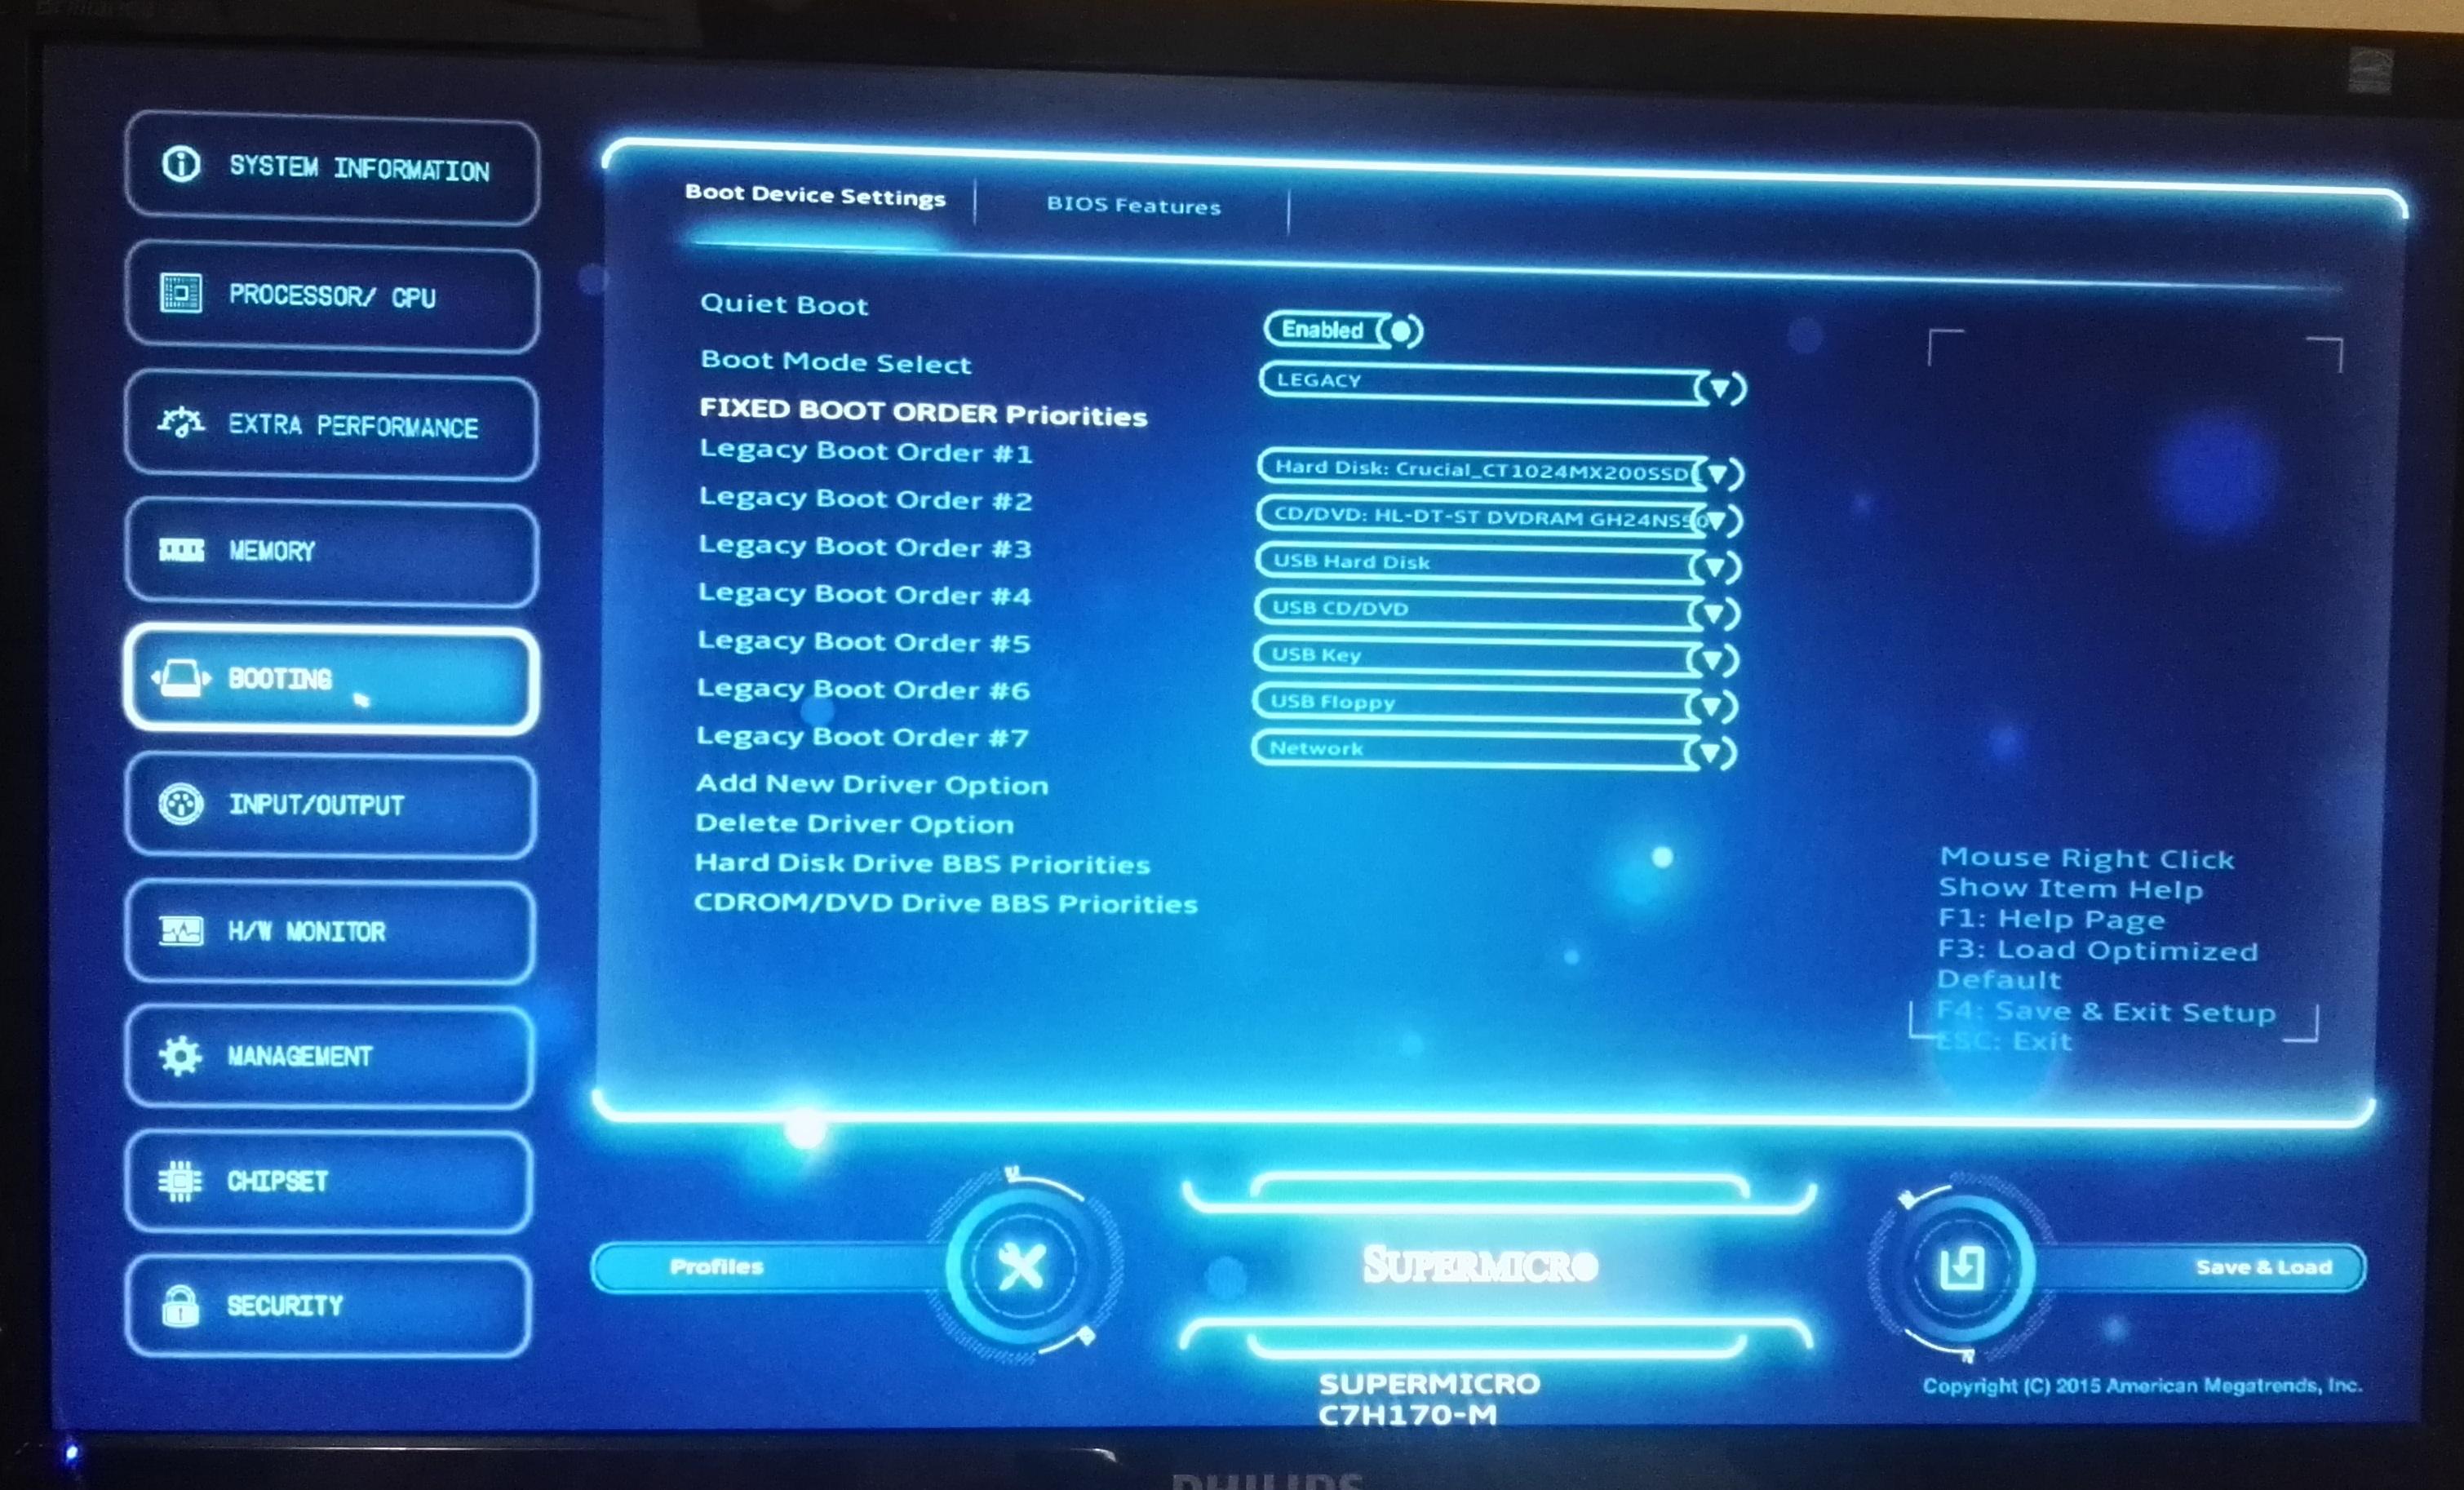 Supermicro C7H170-M BIOS - Why an Overclockable Core i3